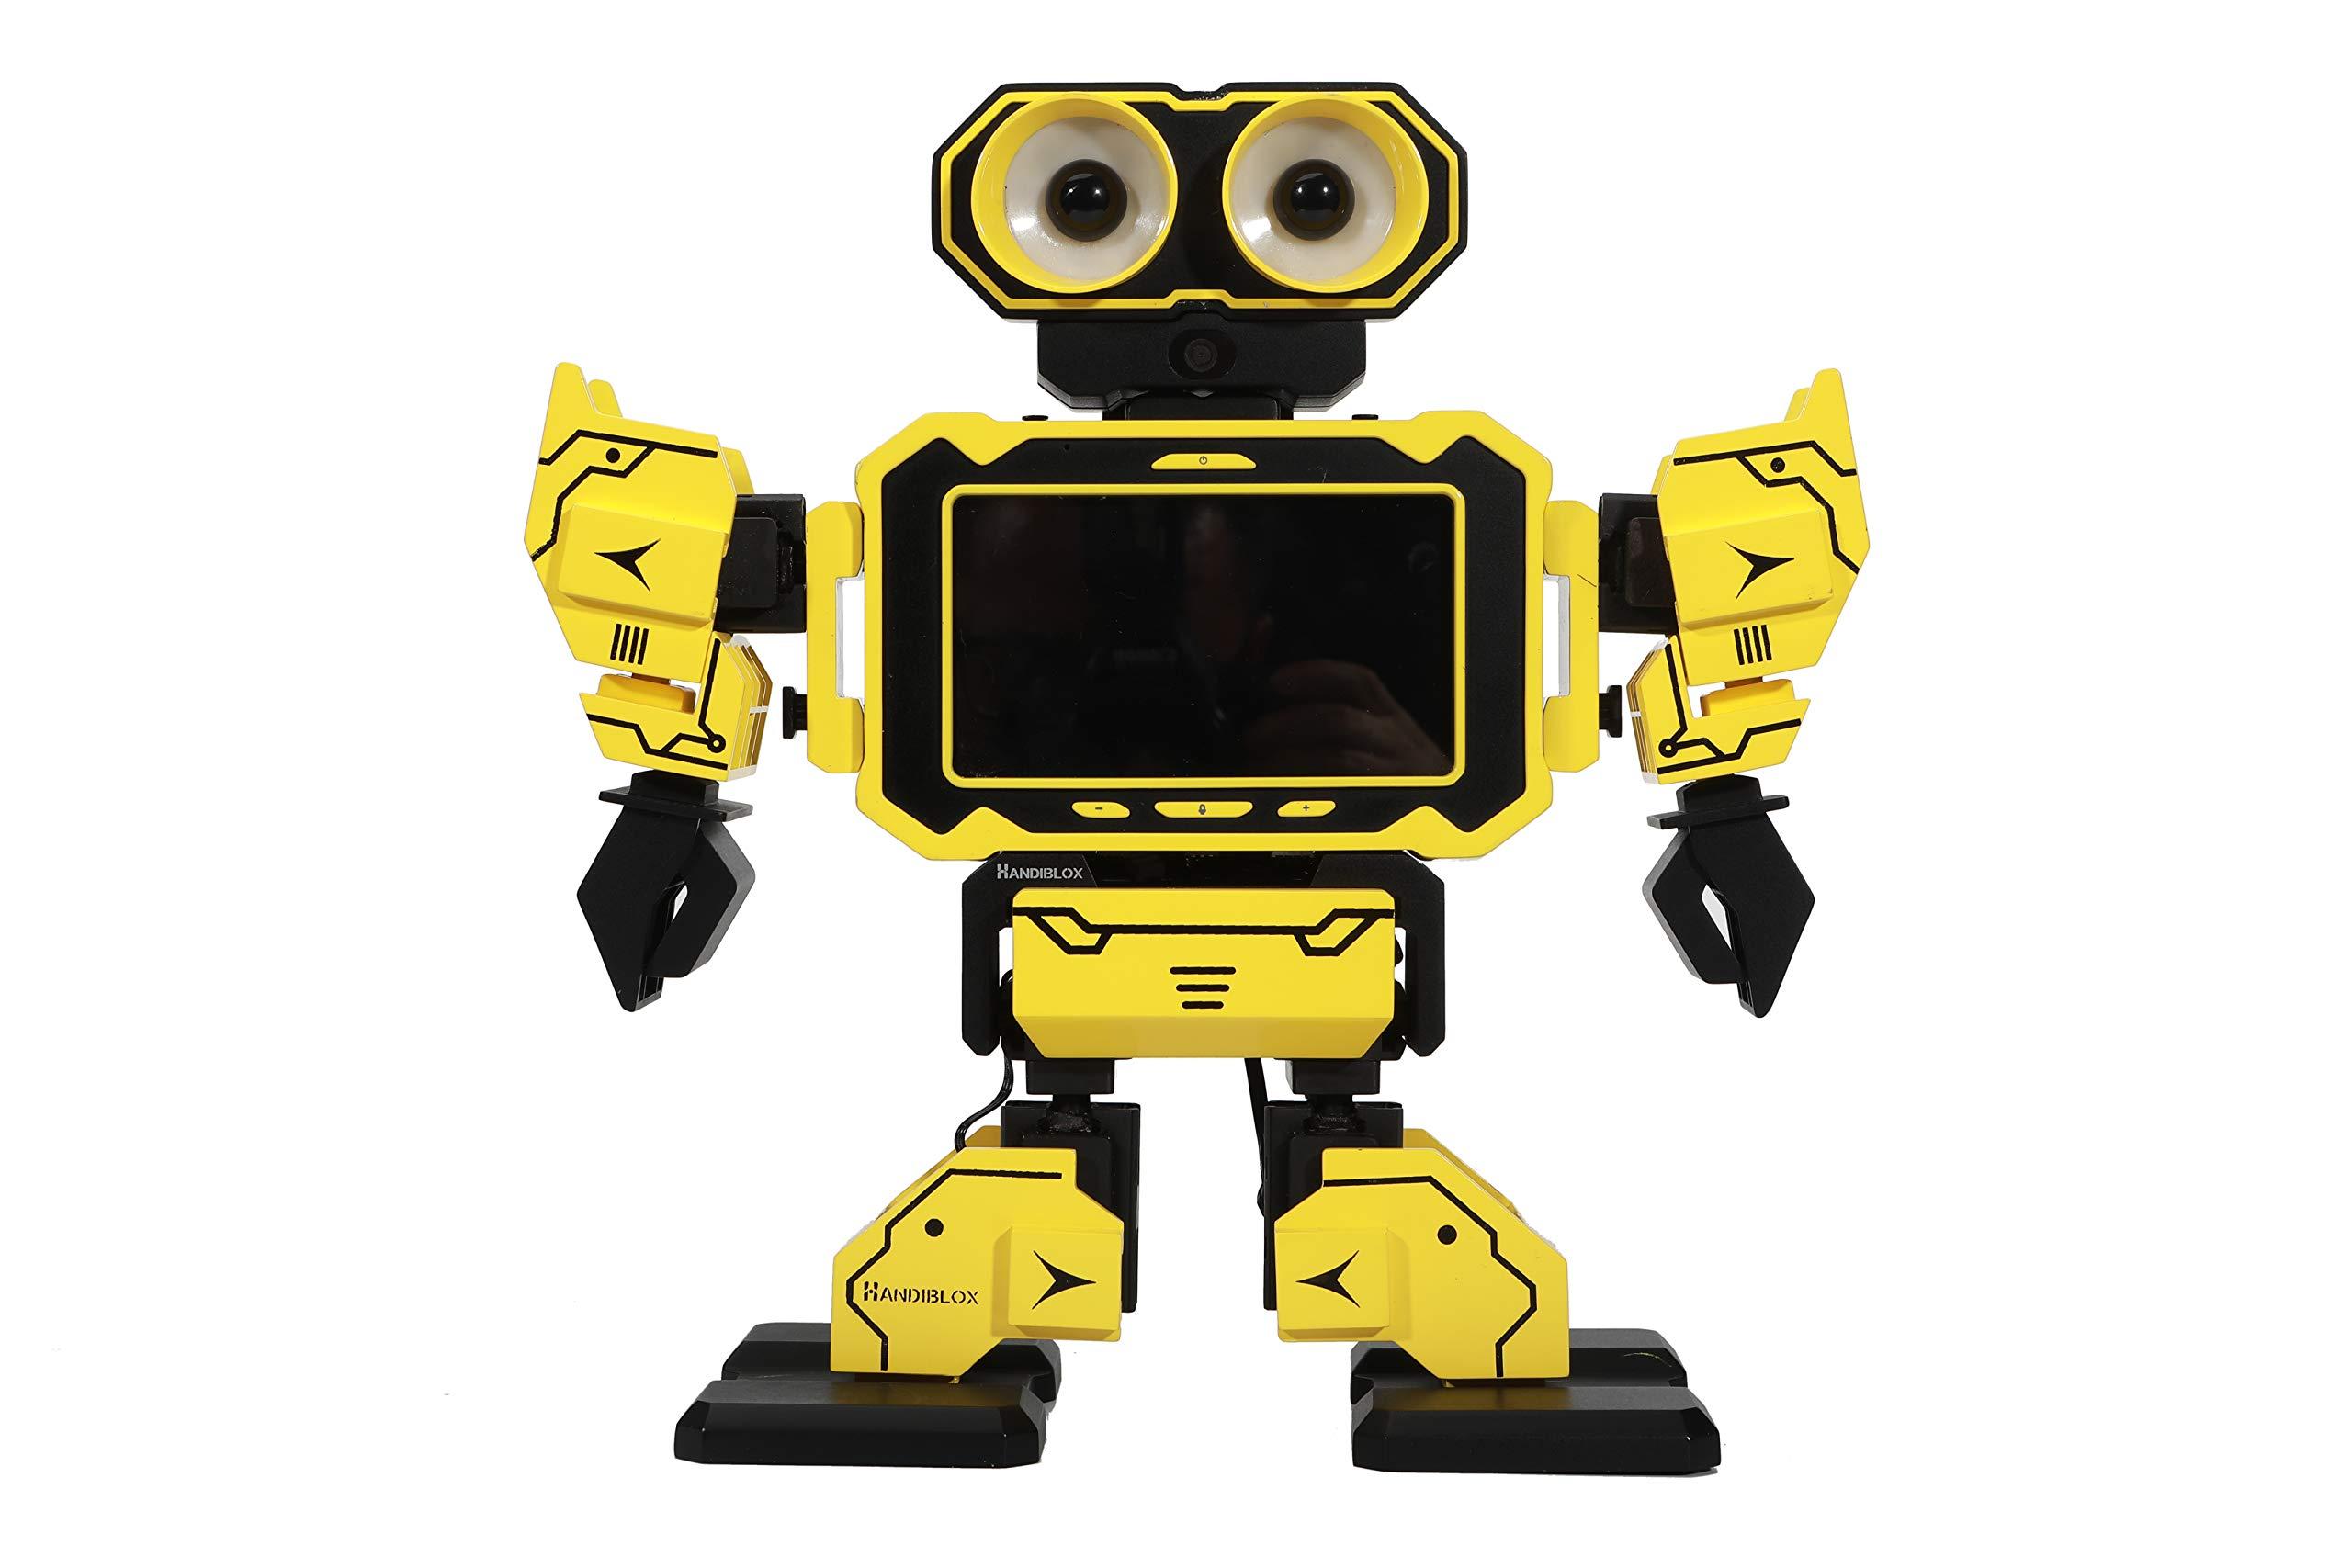 Handiblox – Handi, The Fully Programable, Creative Educational STEM Coding Robot Ages 8+